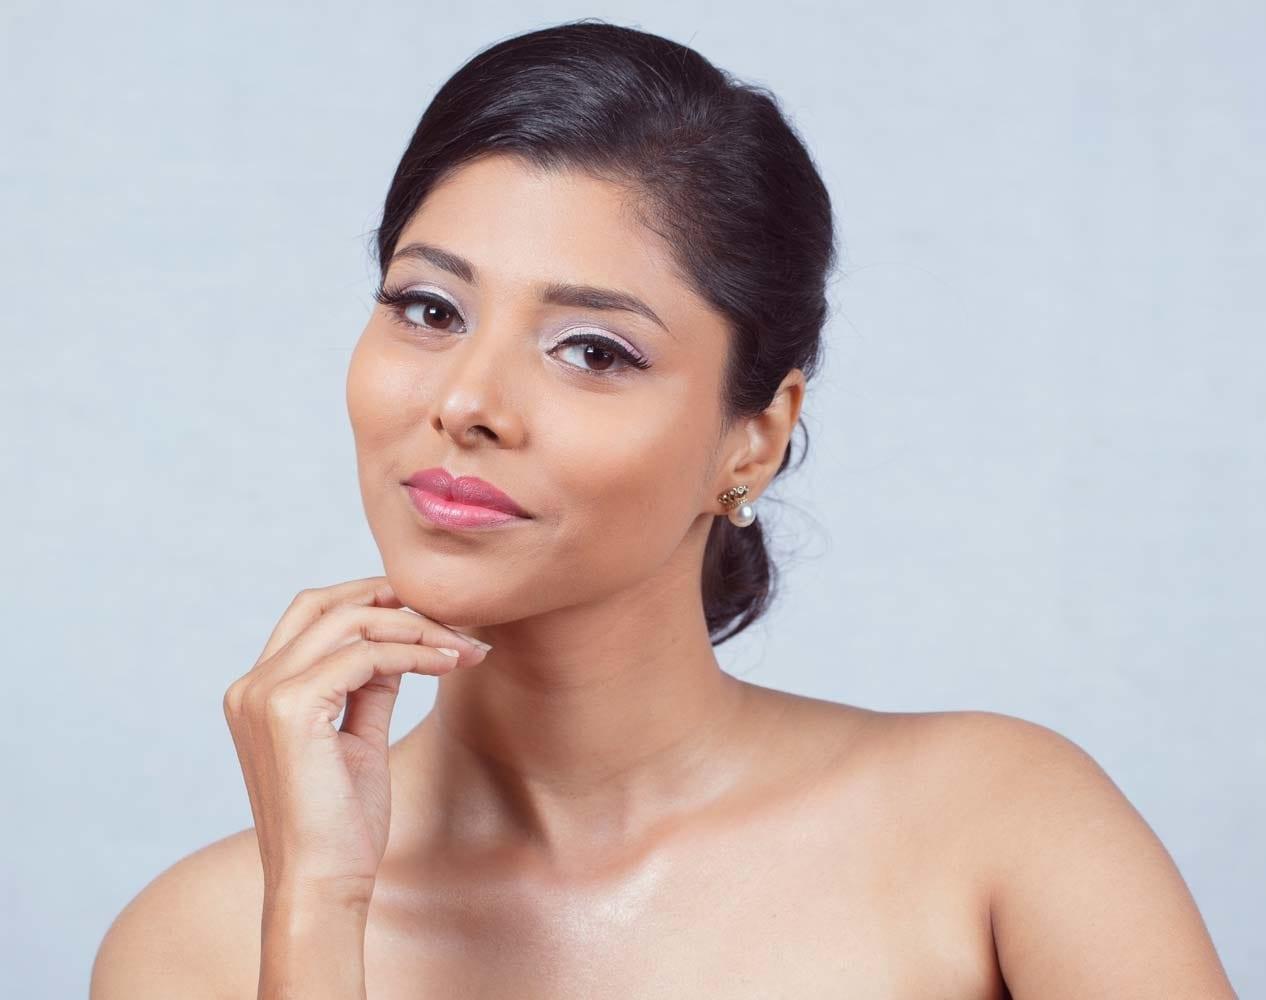 Trikwan - Skin Resurfacing Facial Using Morpheus 8